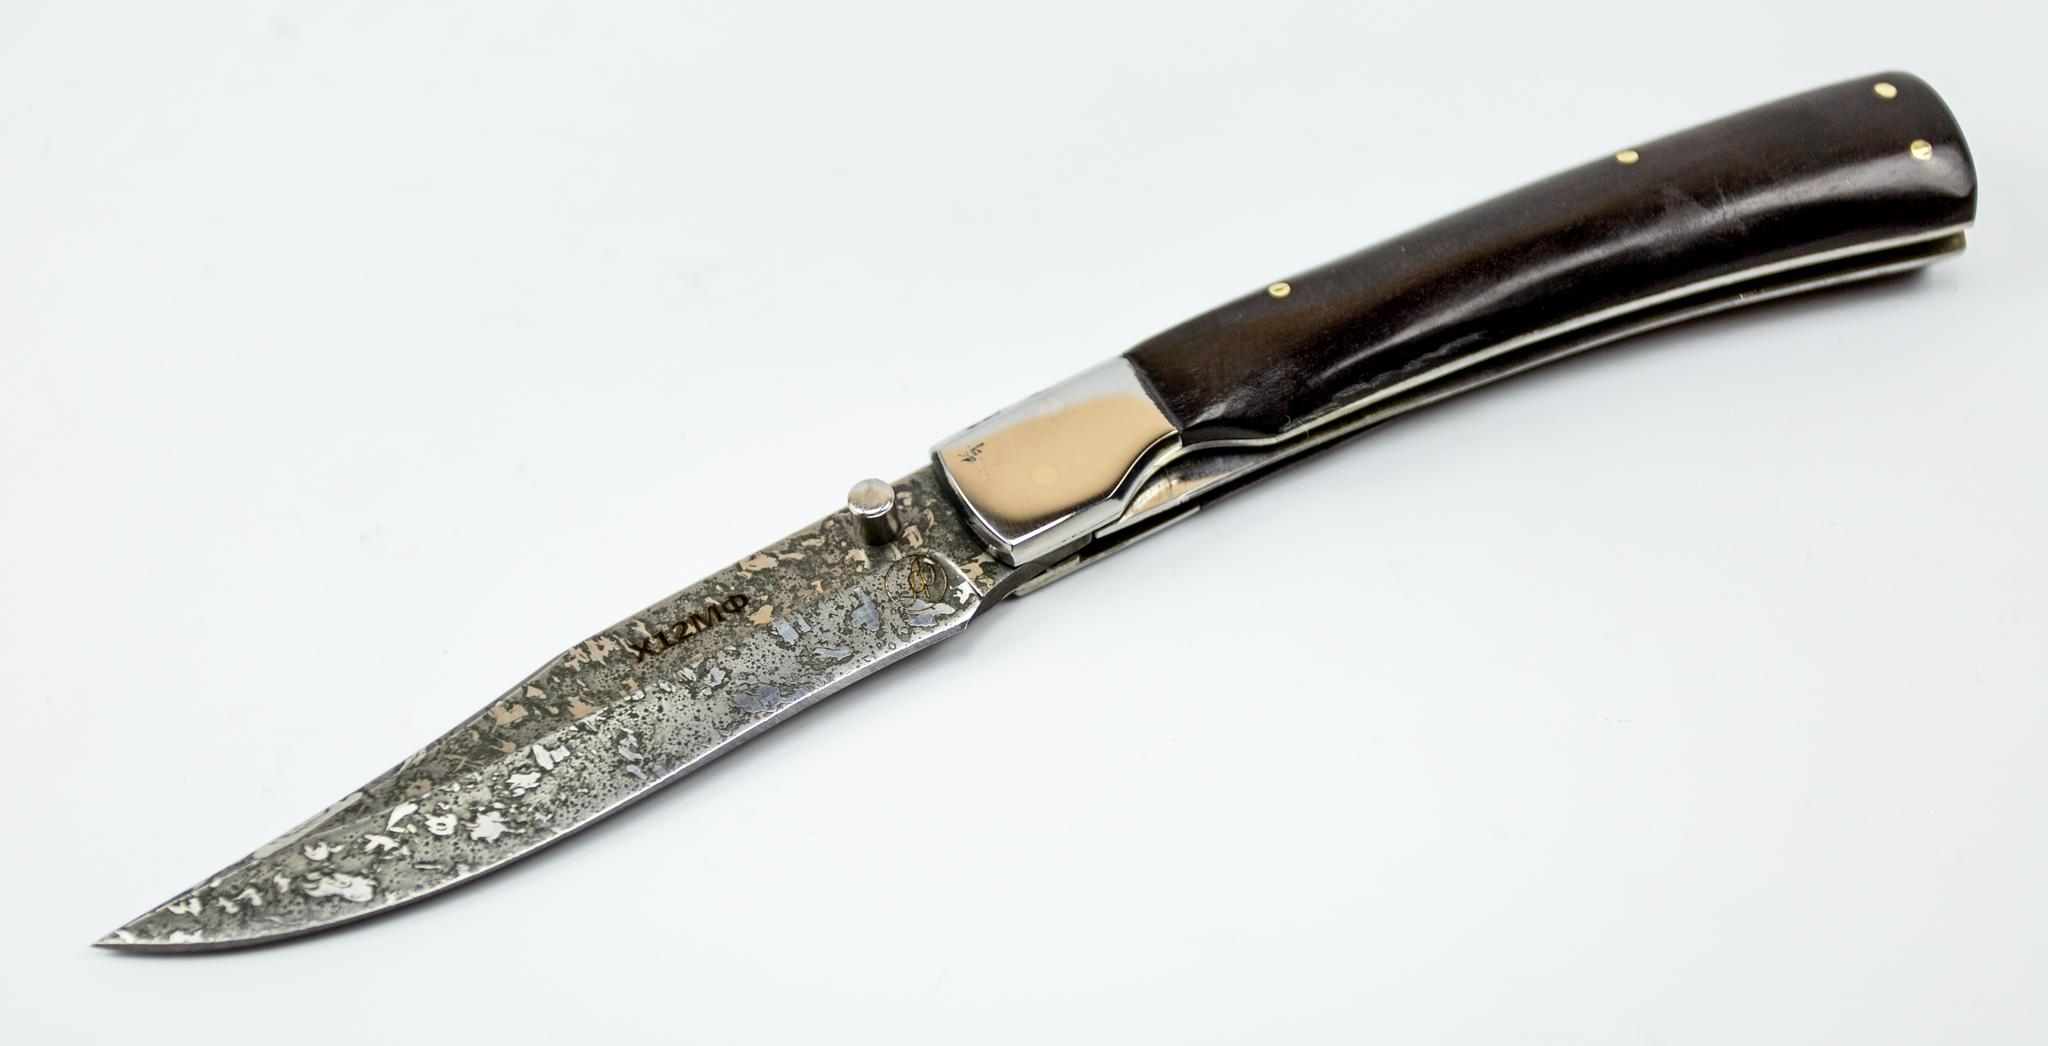 Фото 5 - Складной нож Рысь-1, Х12МФ